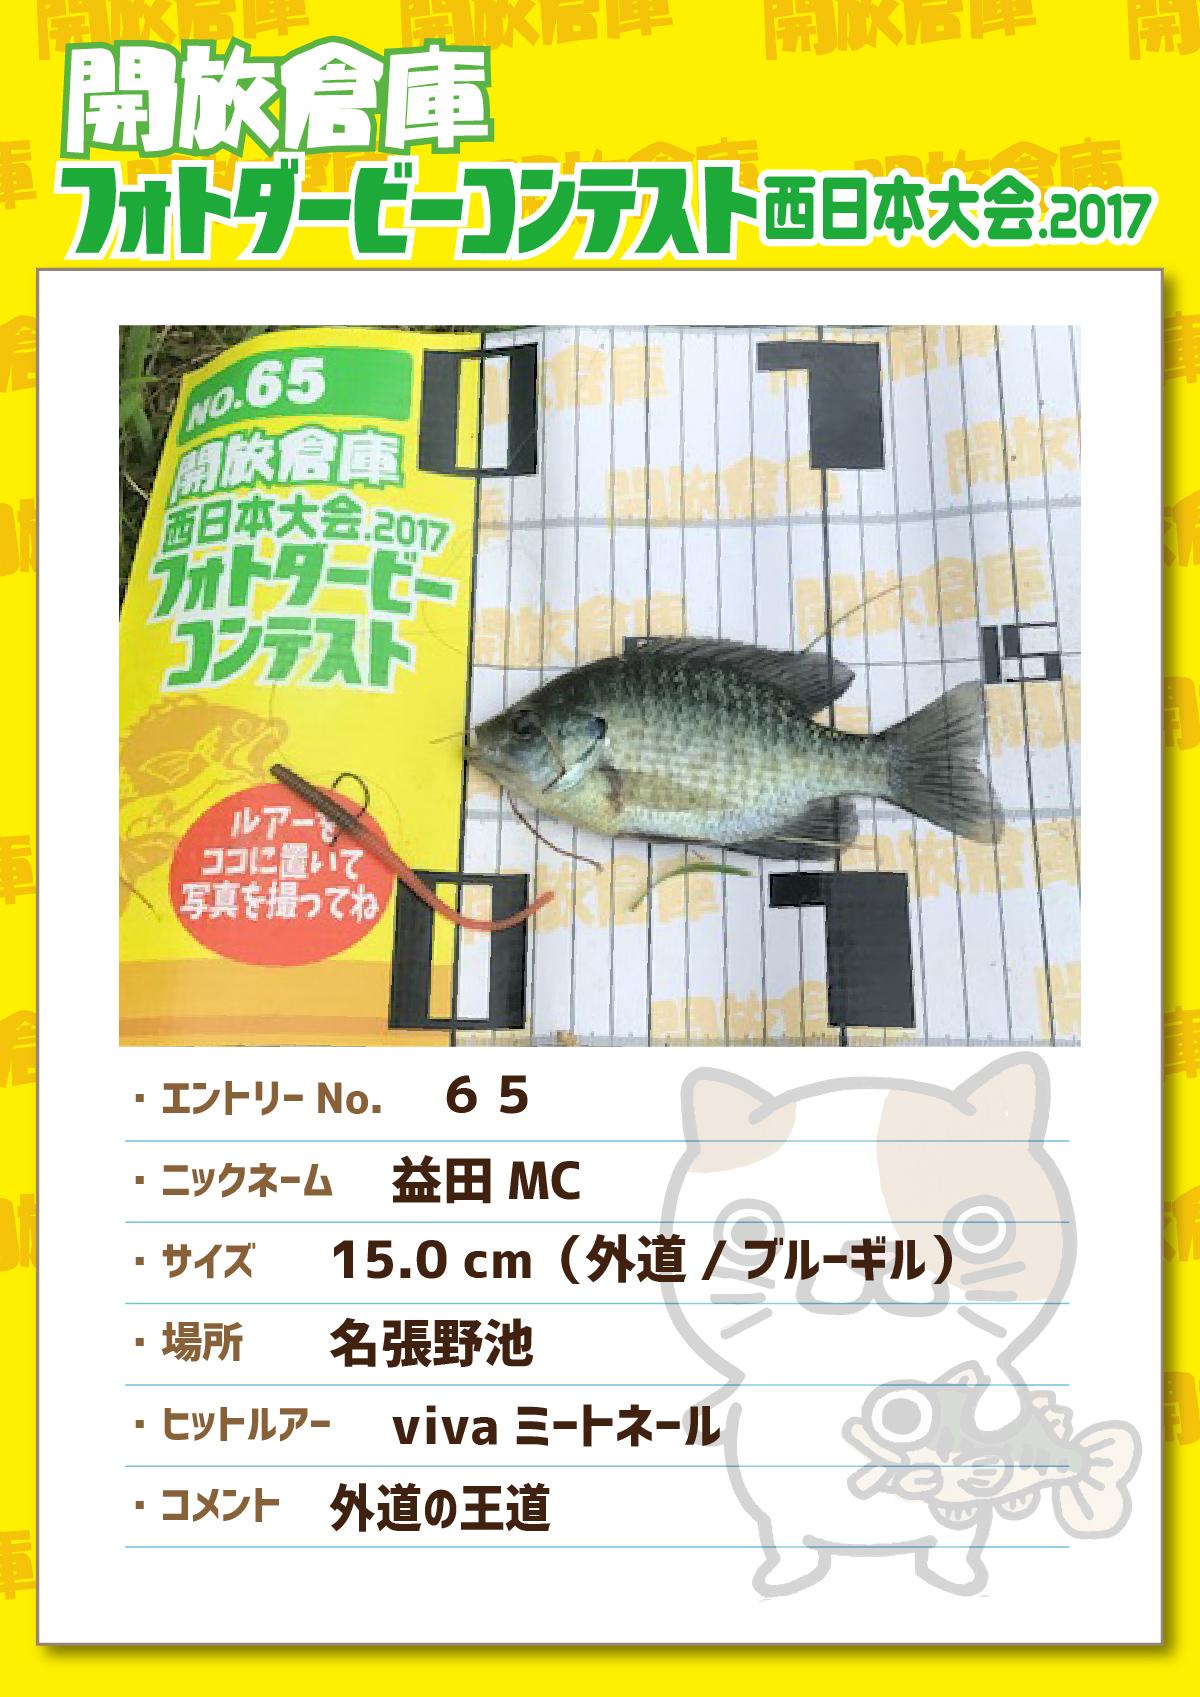 No.065 益田MC 15.0cm外道 名張野池 vivaミートネール 外道の王様